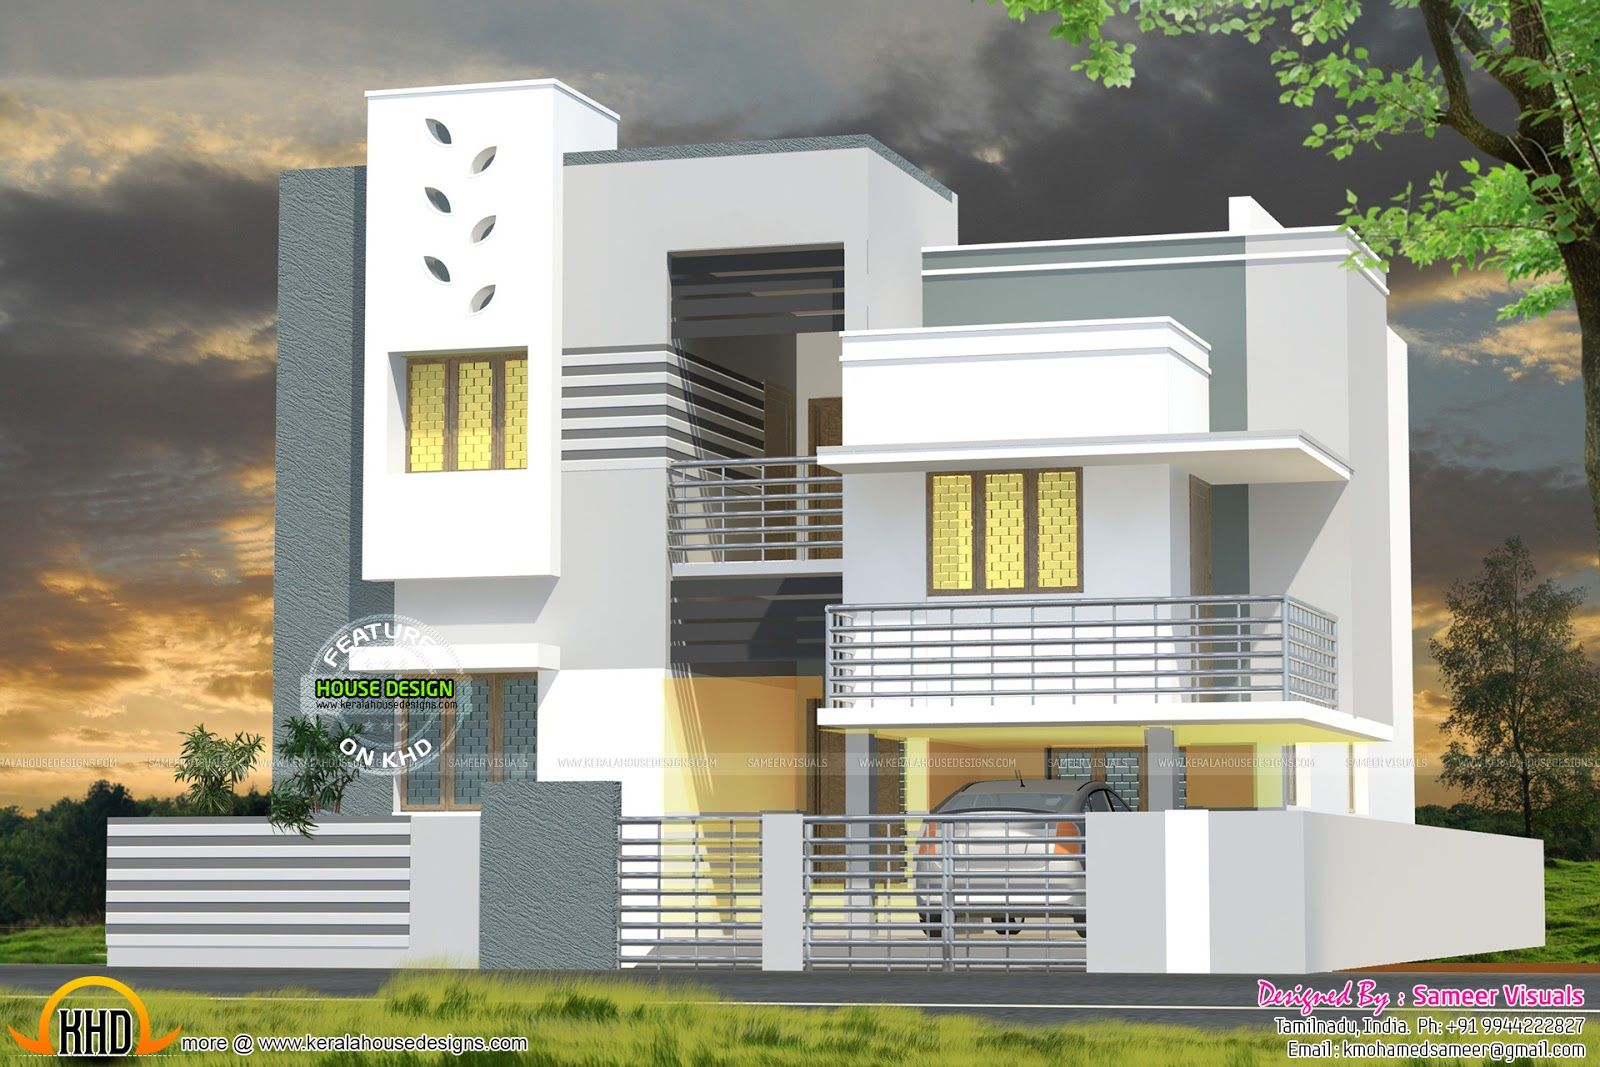 Tamilnadu House Models more picture Tamilnadu House Models please ...